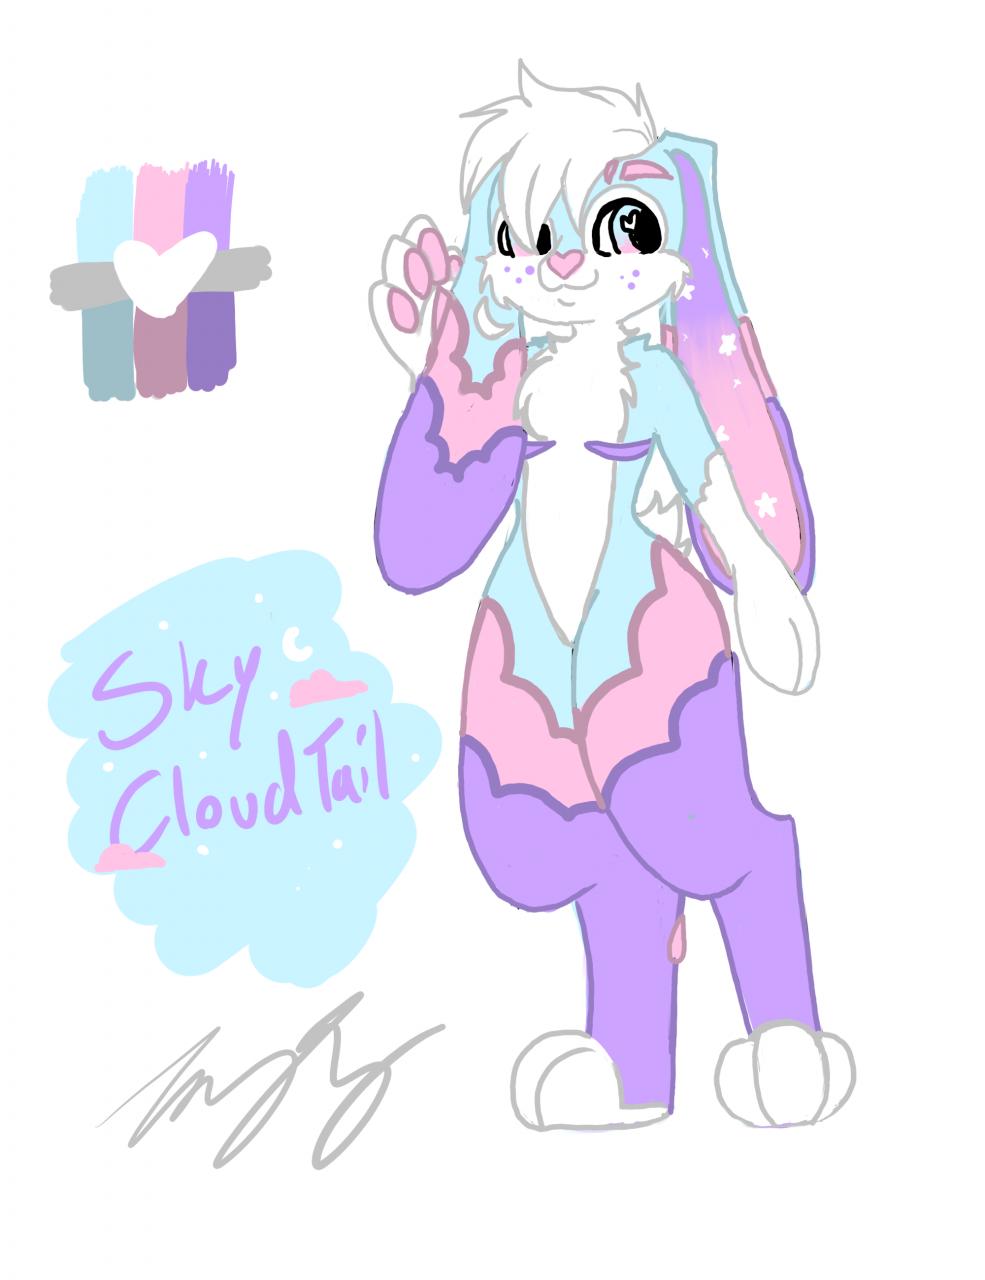 Sky CloudTail Full Body - My sweet Bunny boy